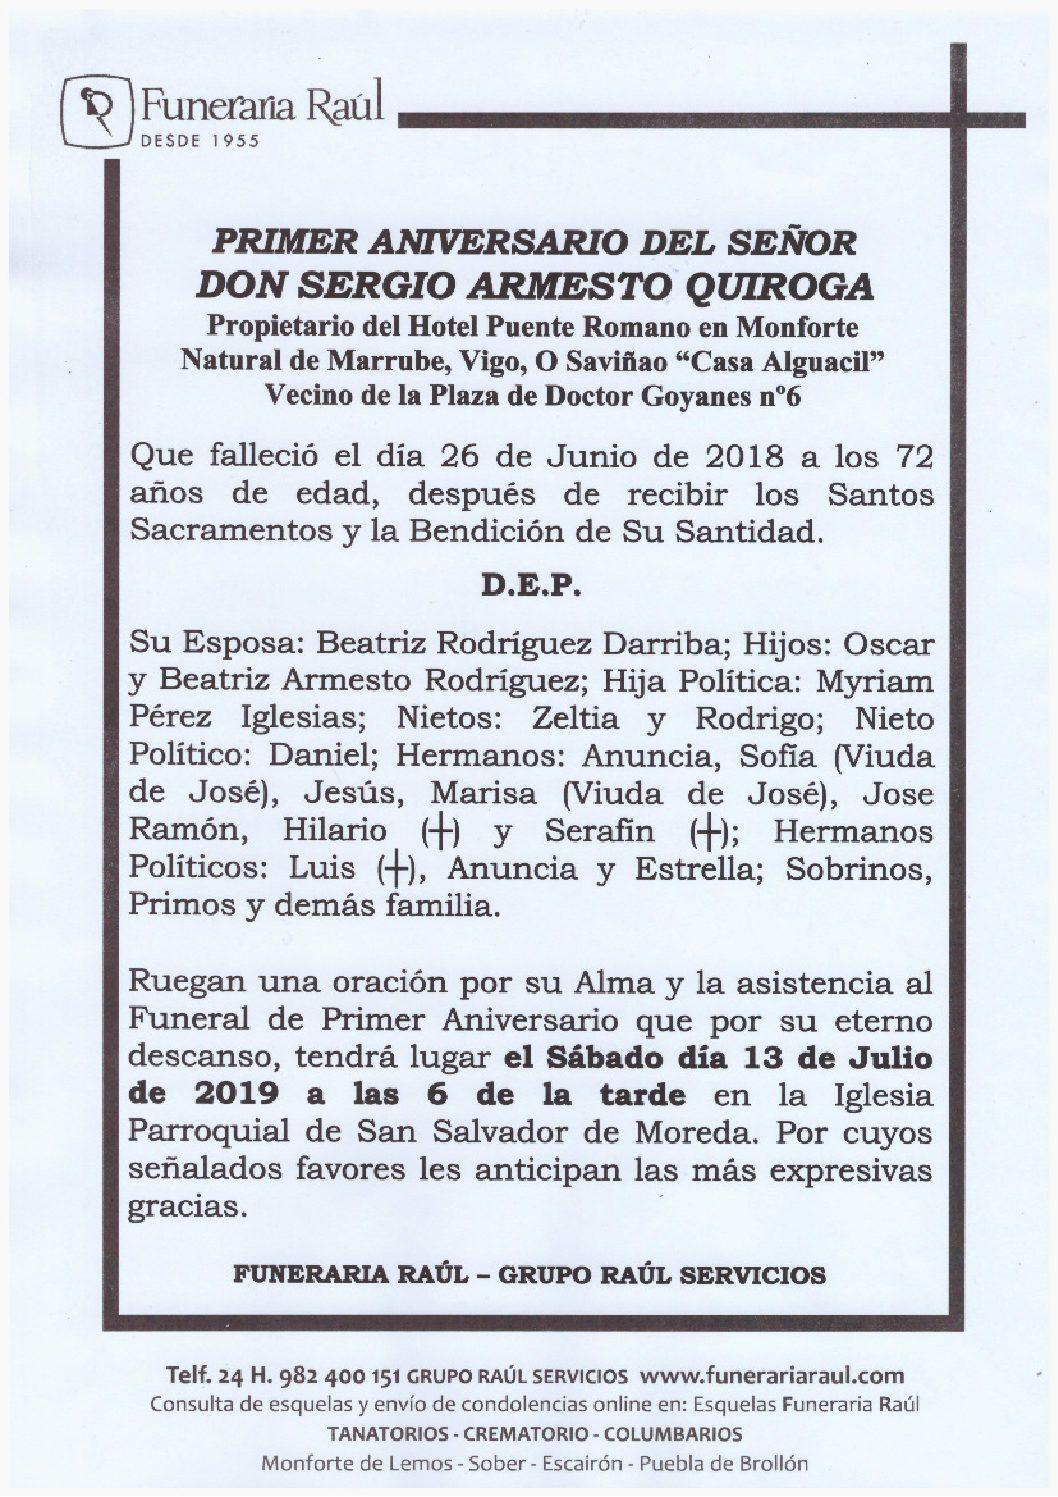 PRIMER ANIVERSARIO DE DON SERGIO ARMESTO QUIROGA